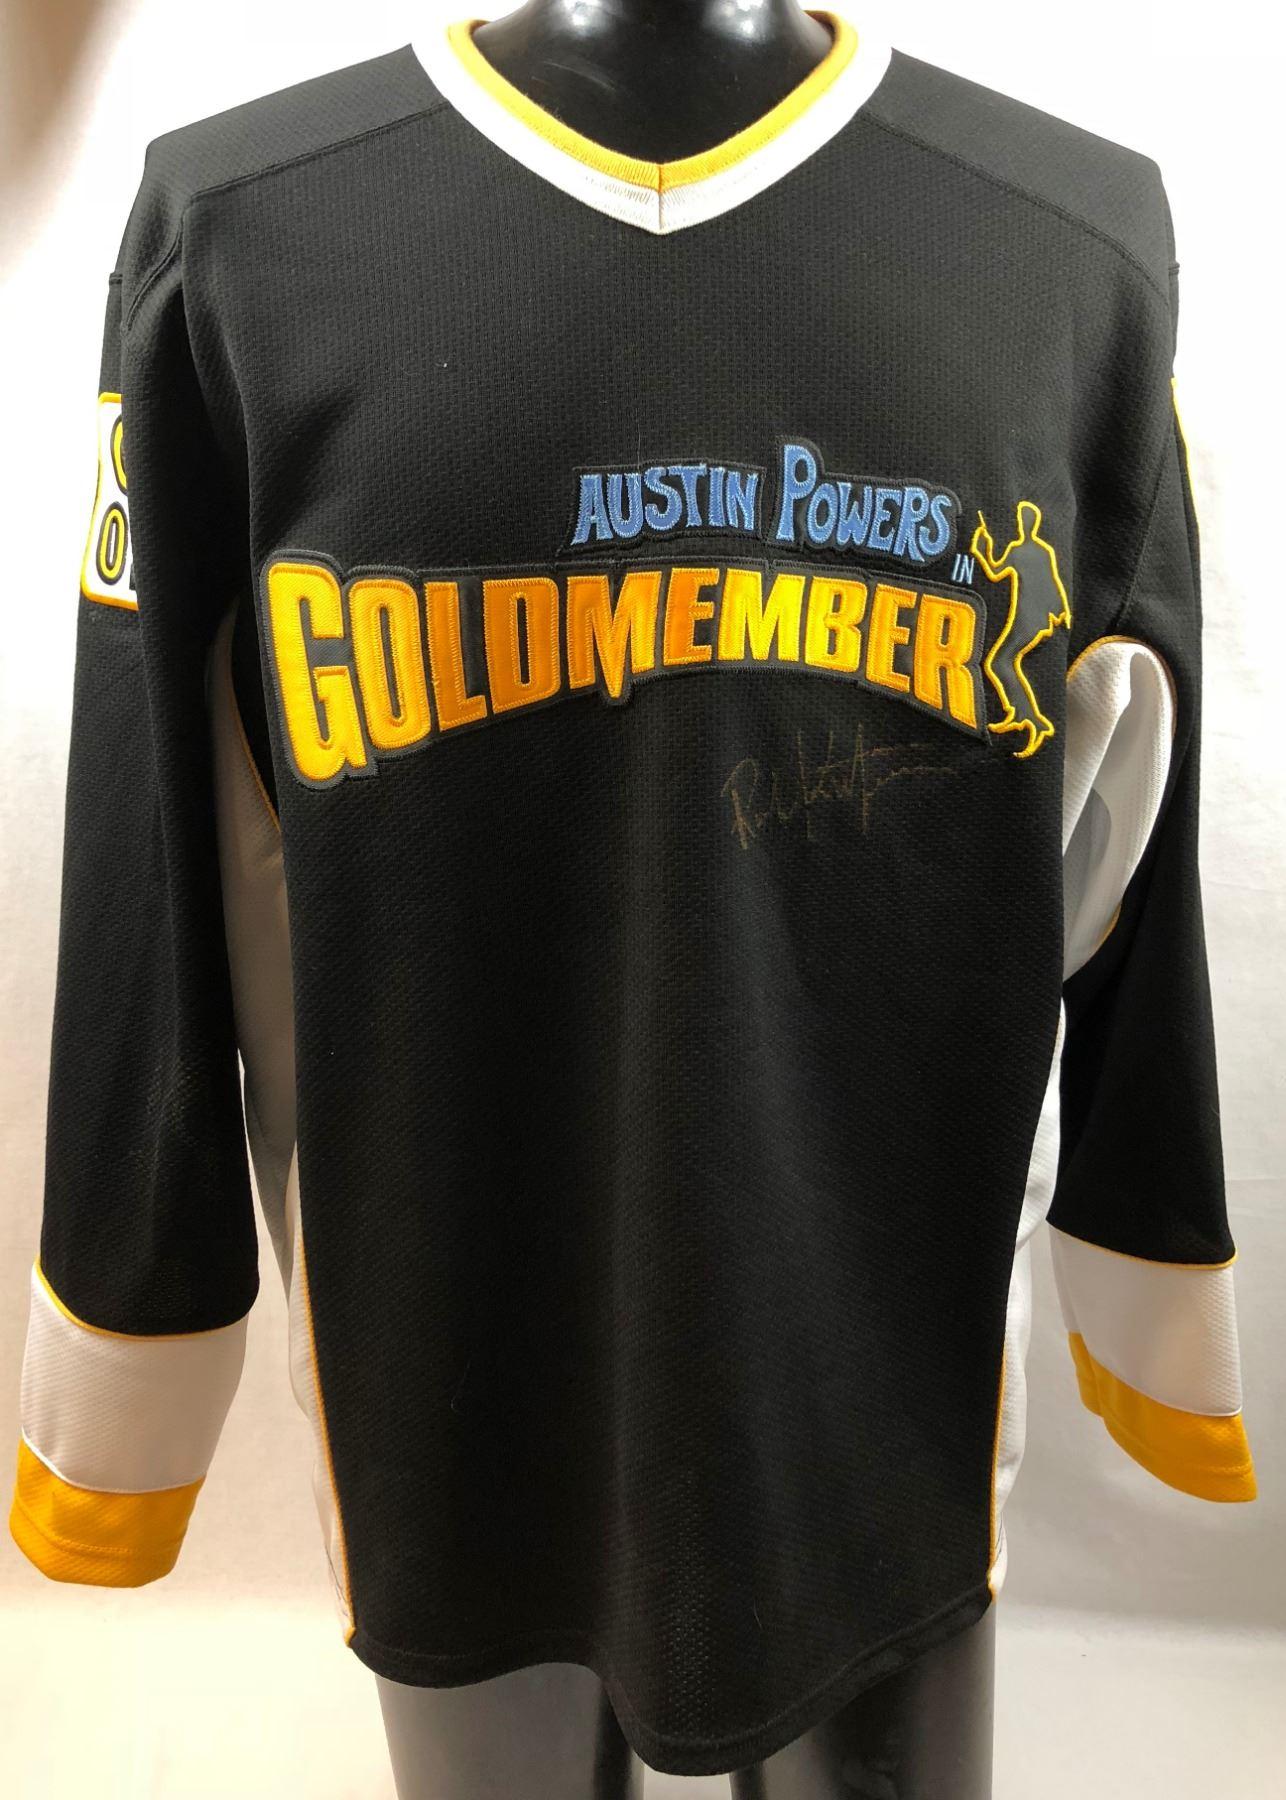 Austin Powers In Goldmember 2002 Robert Kurtzman S Crew Shirt